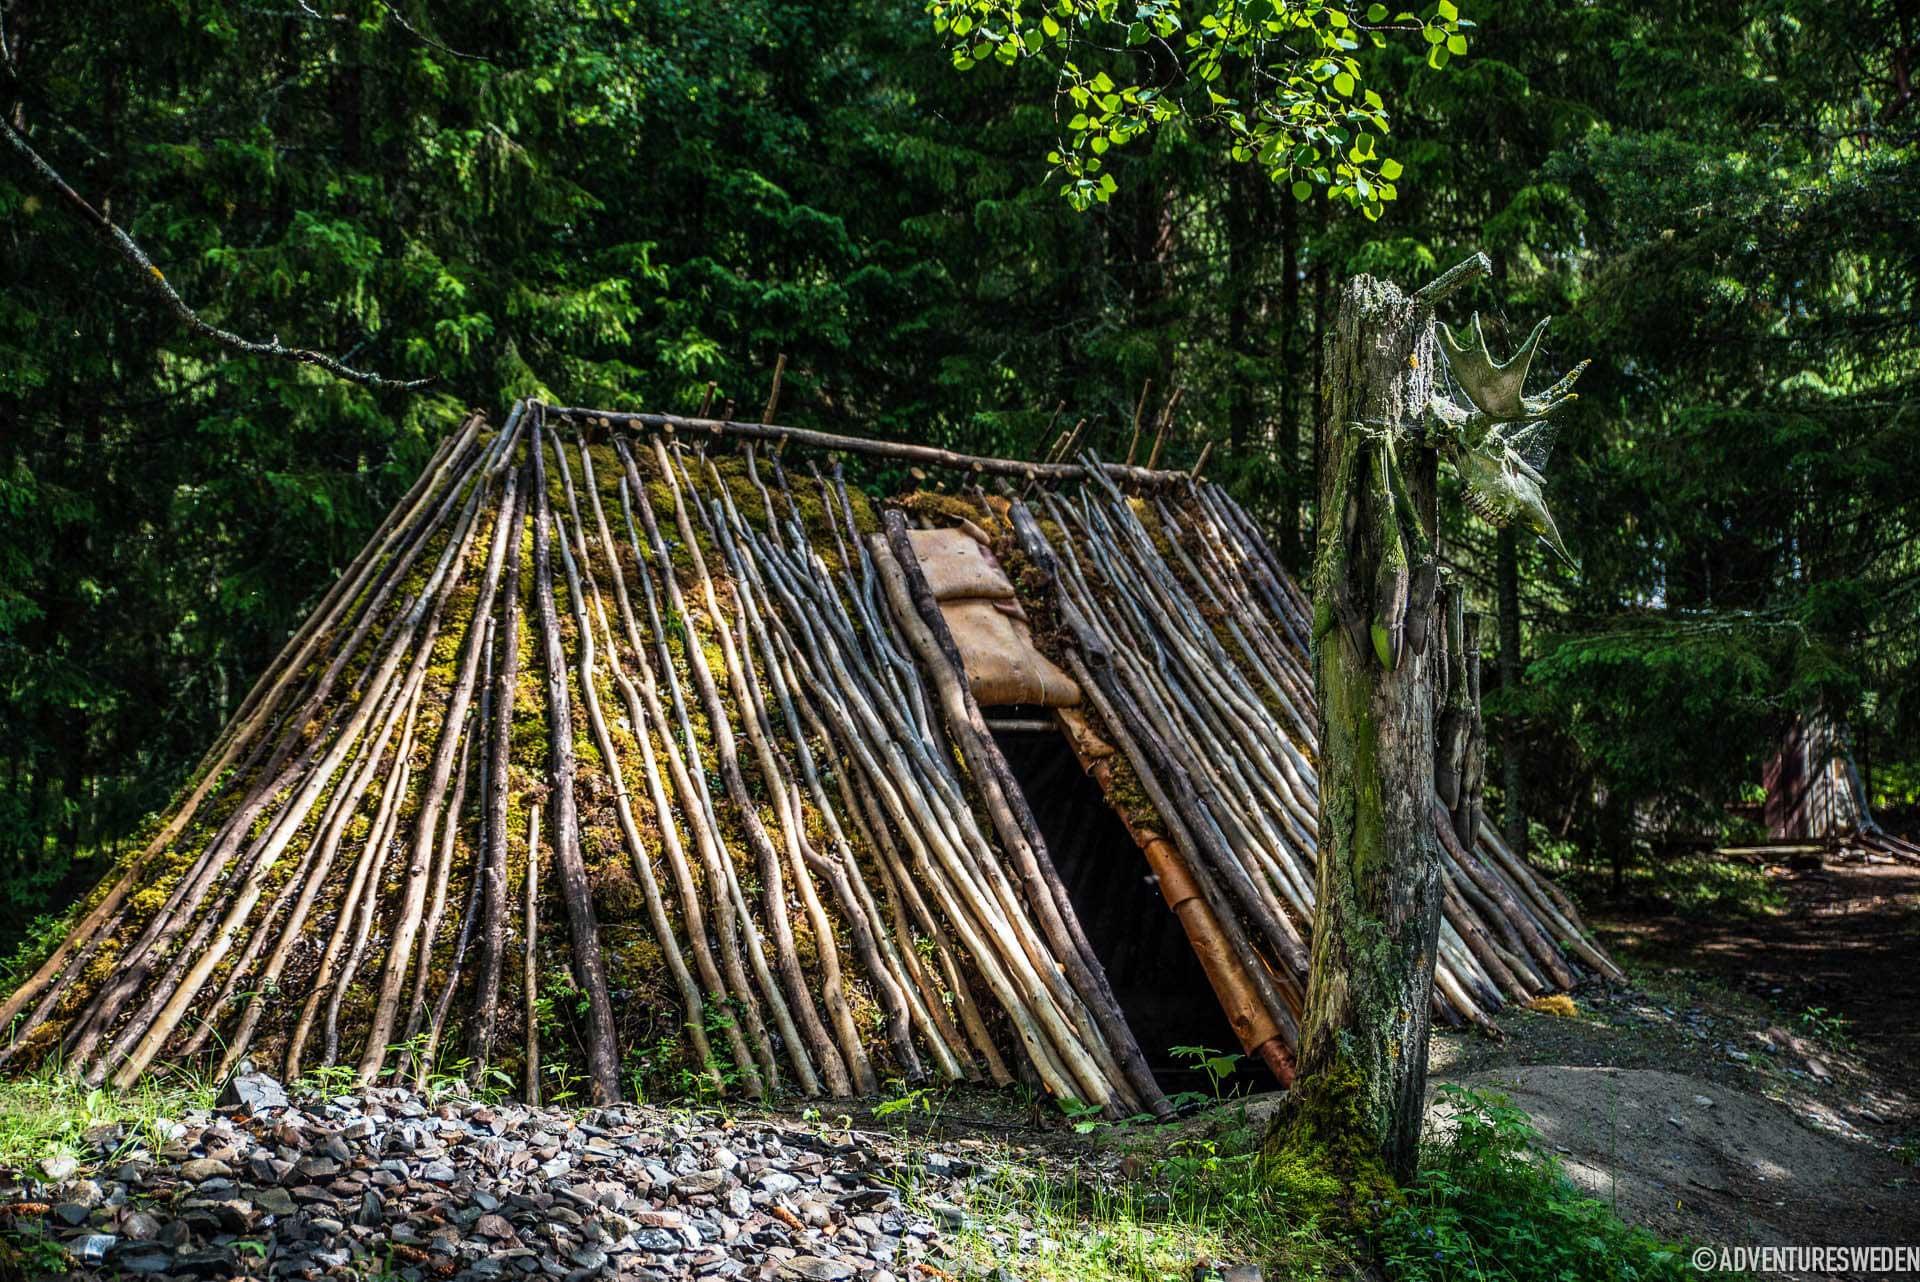 Forntida vinterhydda i Glösa | Foto: Erika Willners